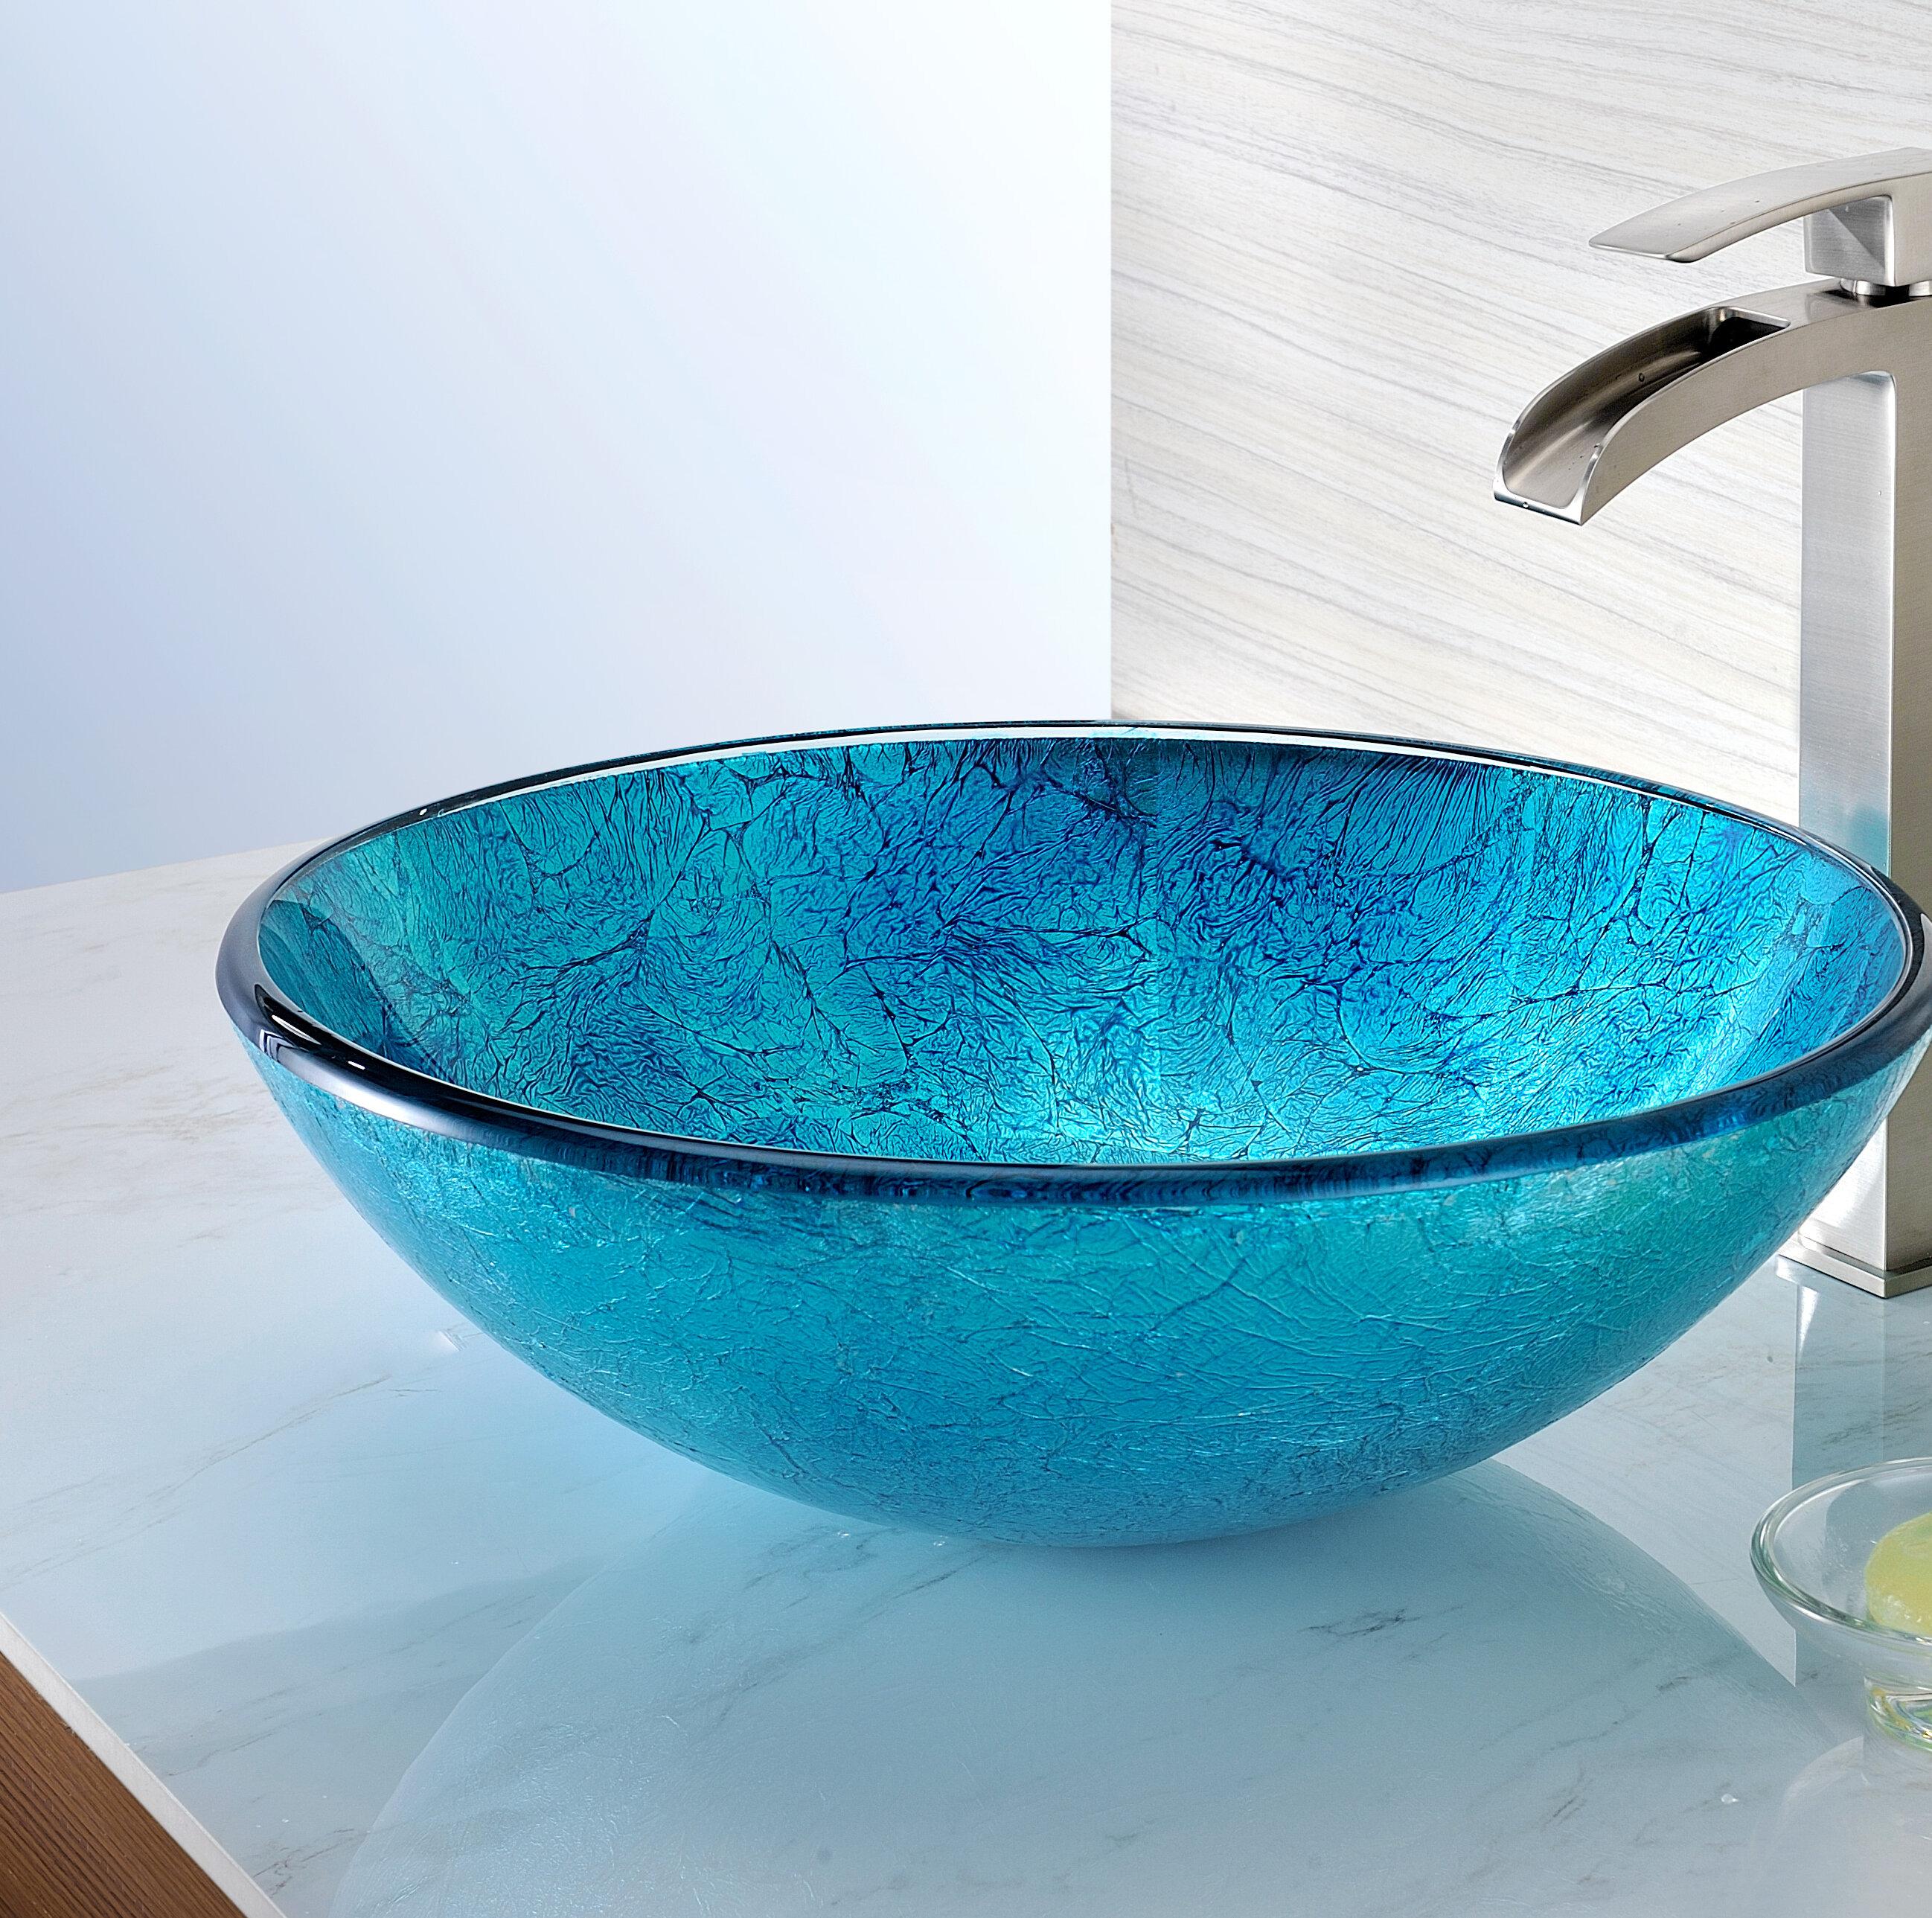 Anzzi Tereali Series Blue Ice Tempered Glass Circular Vessel Bathroom Sink Wayfair Ca